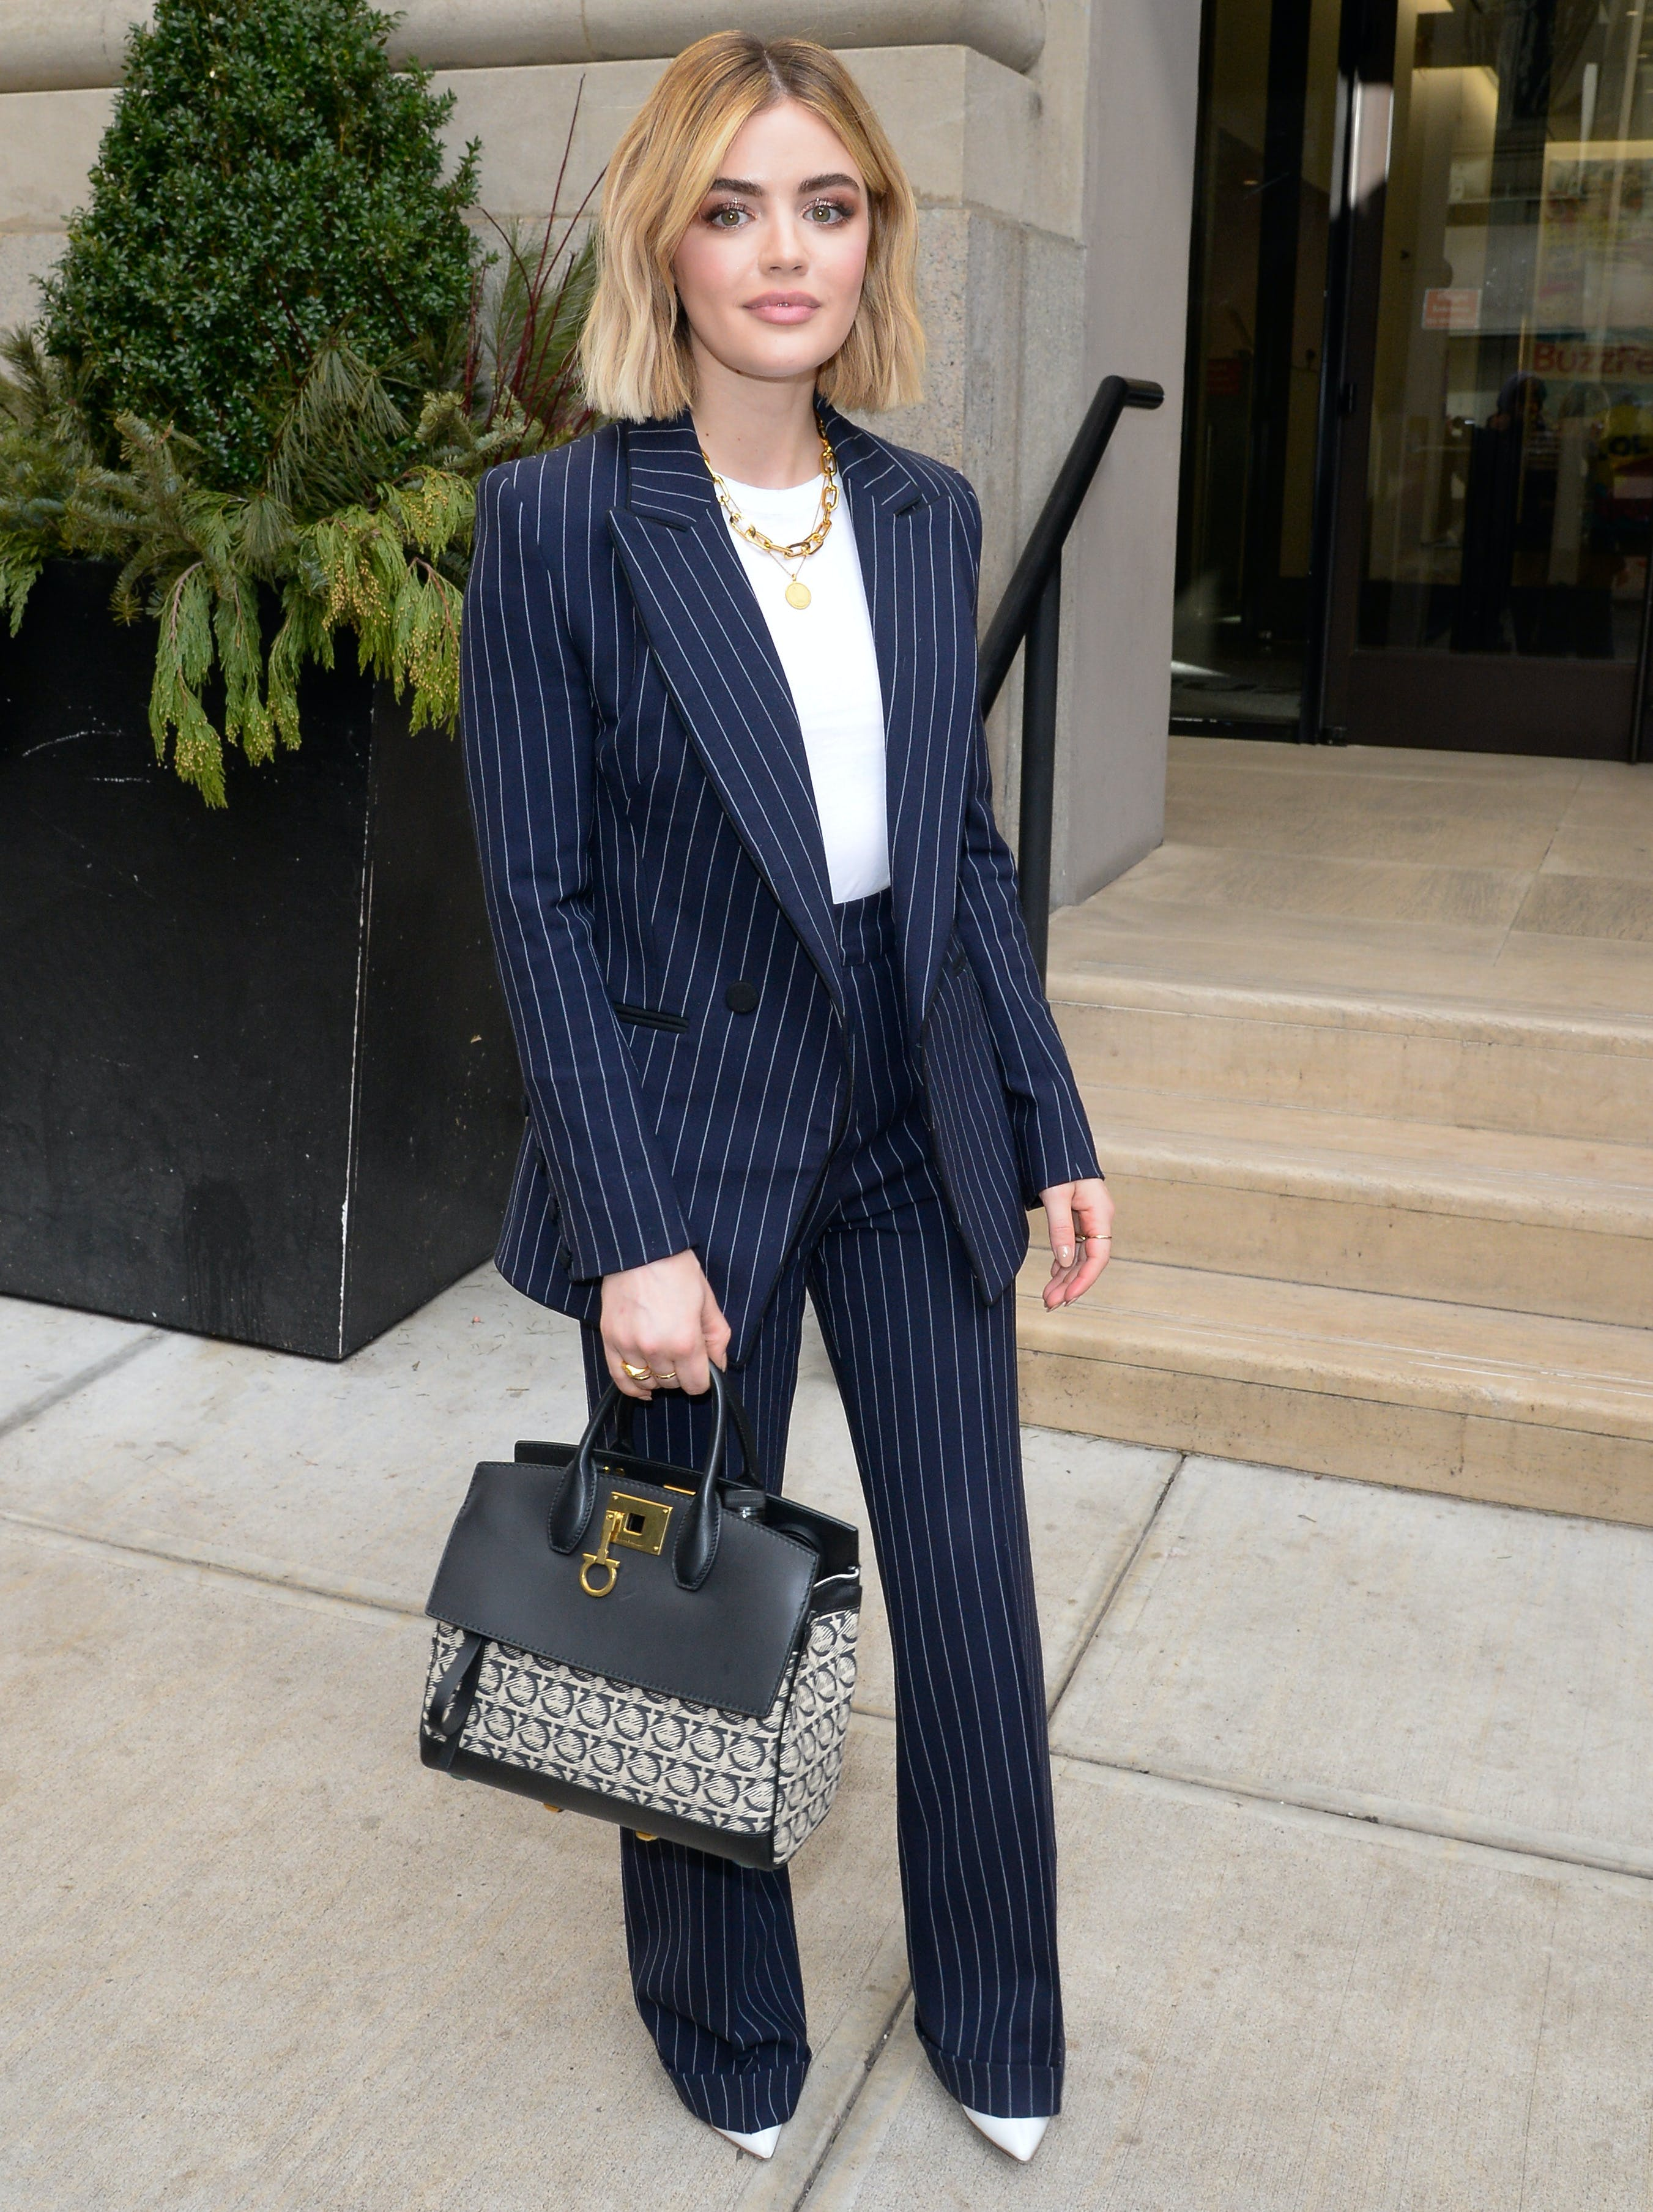 lucy hale wearing a pinstripe suit